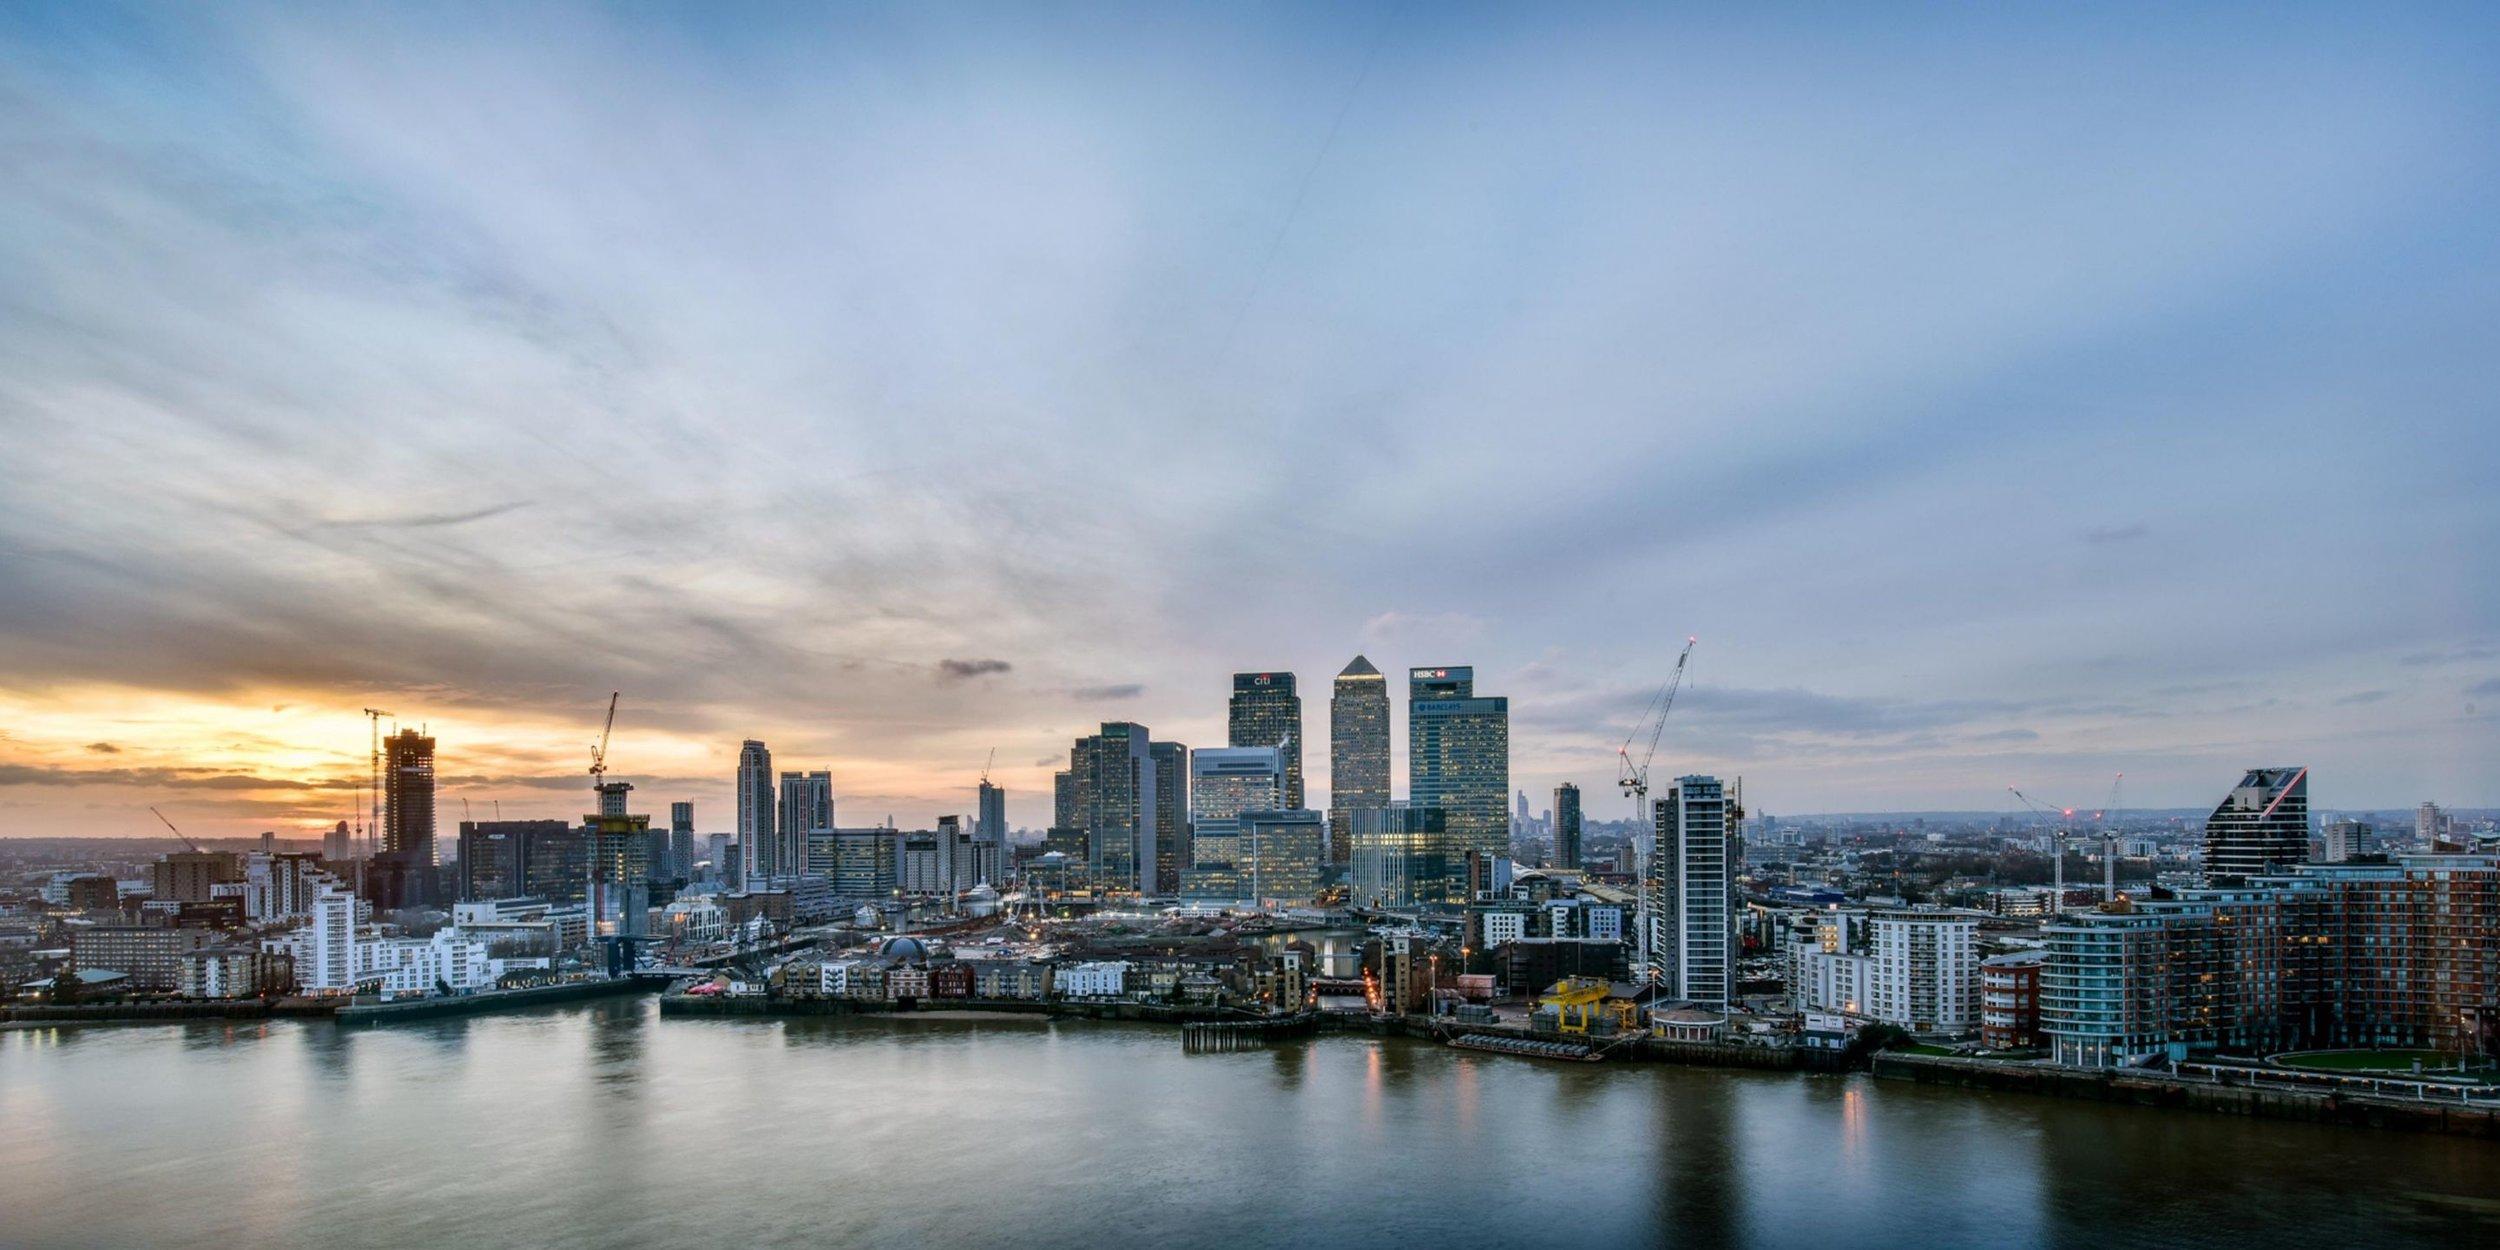 intercontinental-london-5304200266-2x1.jpg